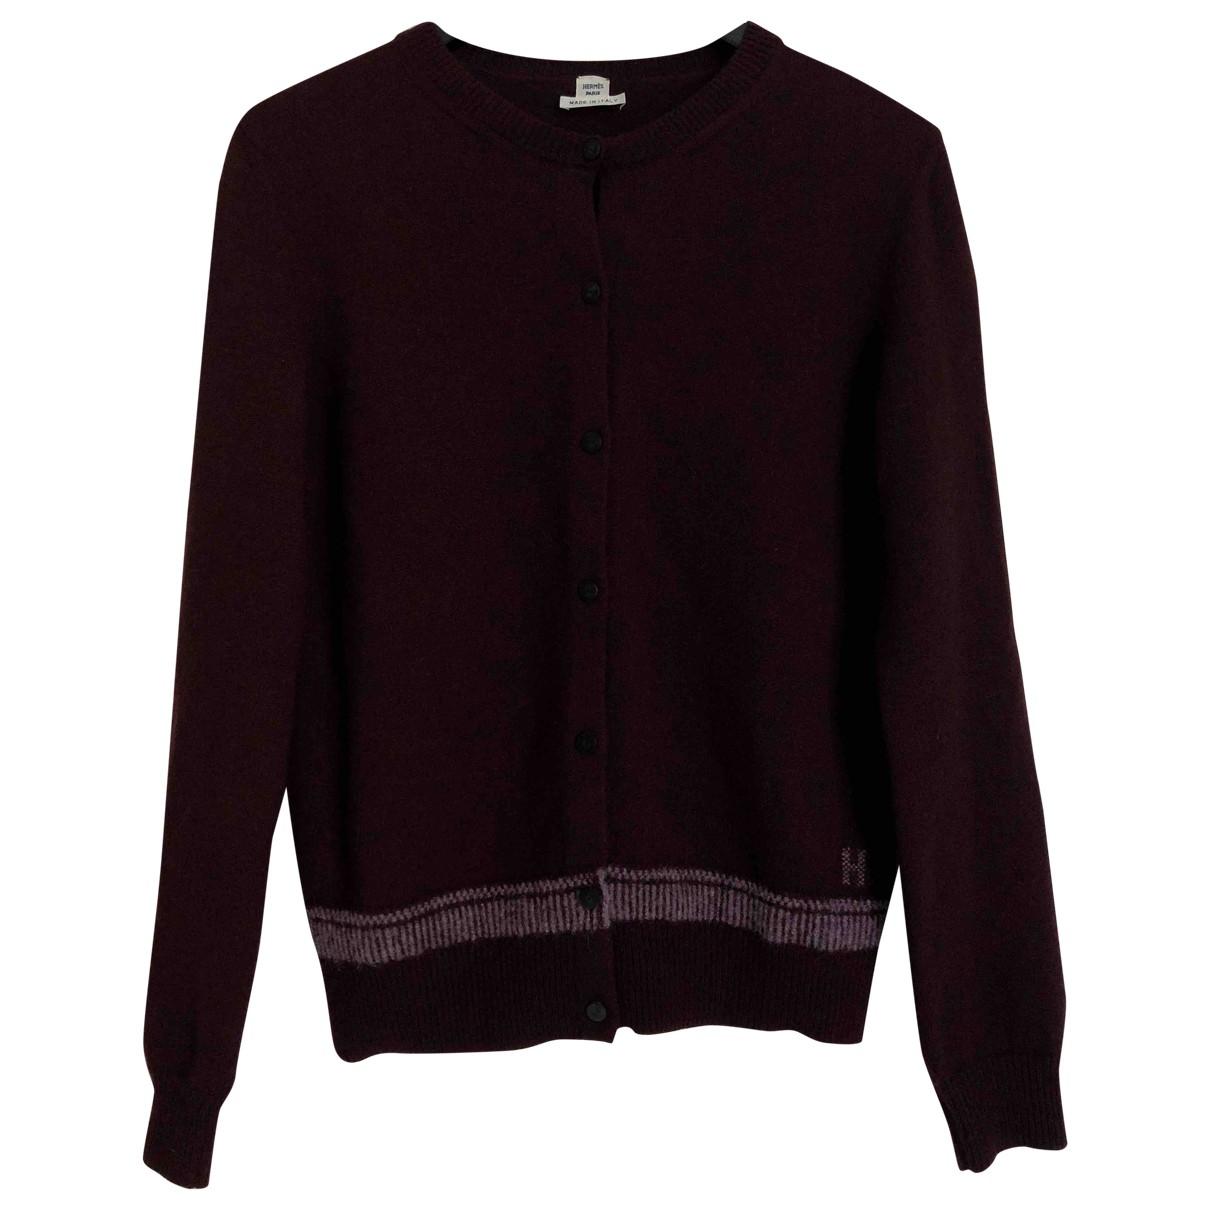 Hermès \N Burgundy Wool Knitwear for Women S International